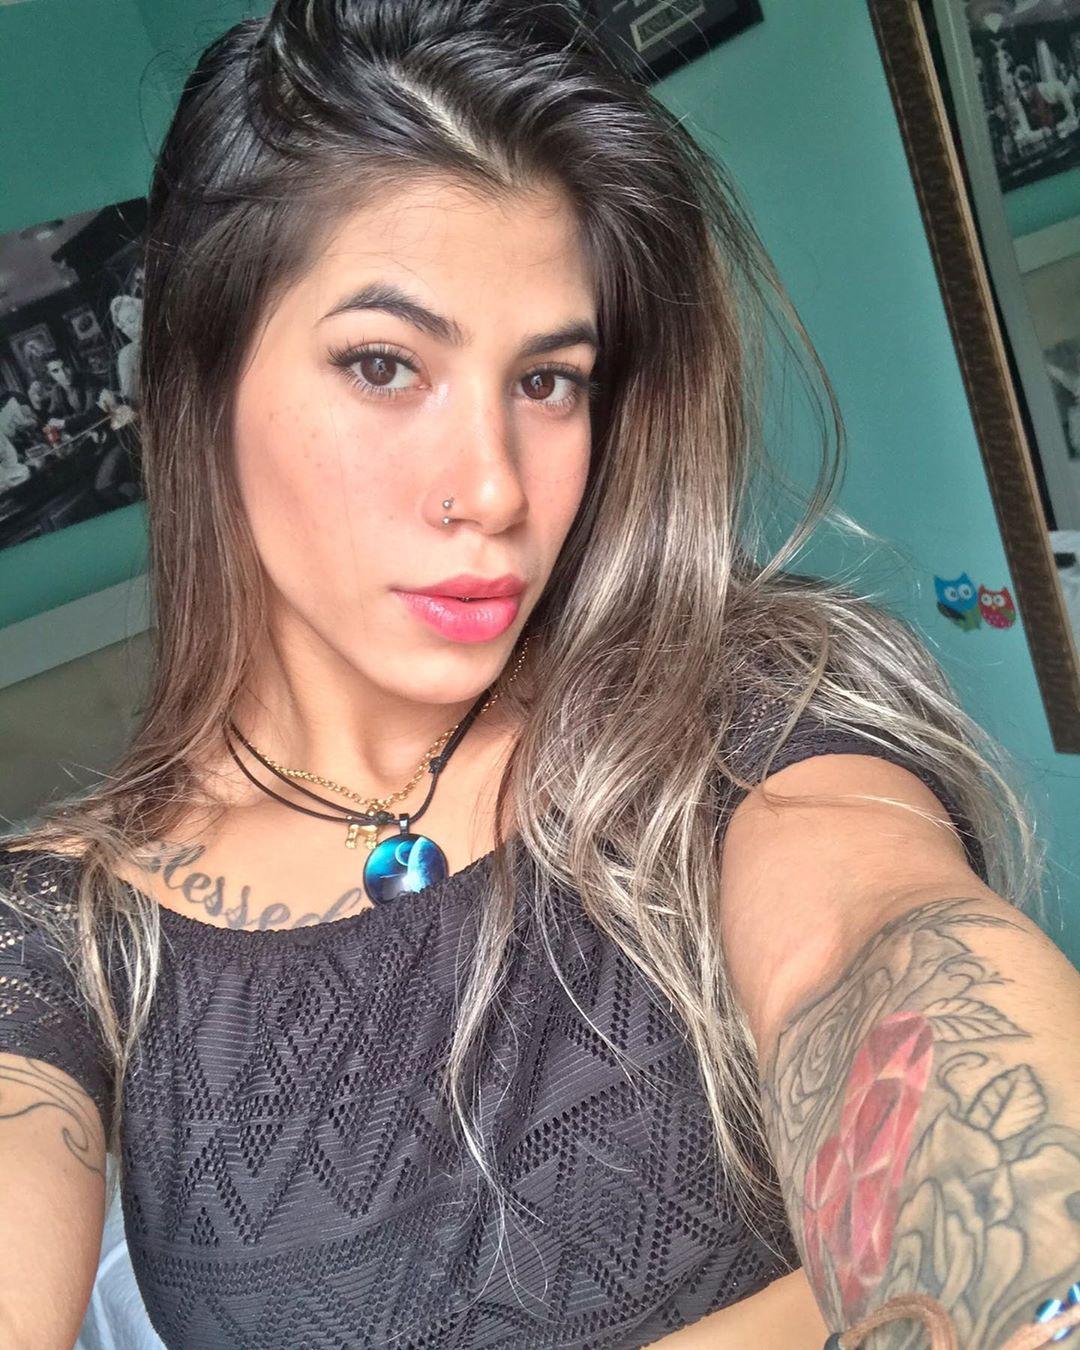 Yasmin-Safira-Wallpapers-Insta-Fit-Bio-1